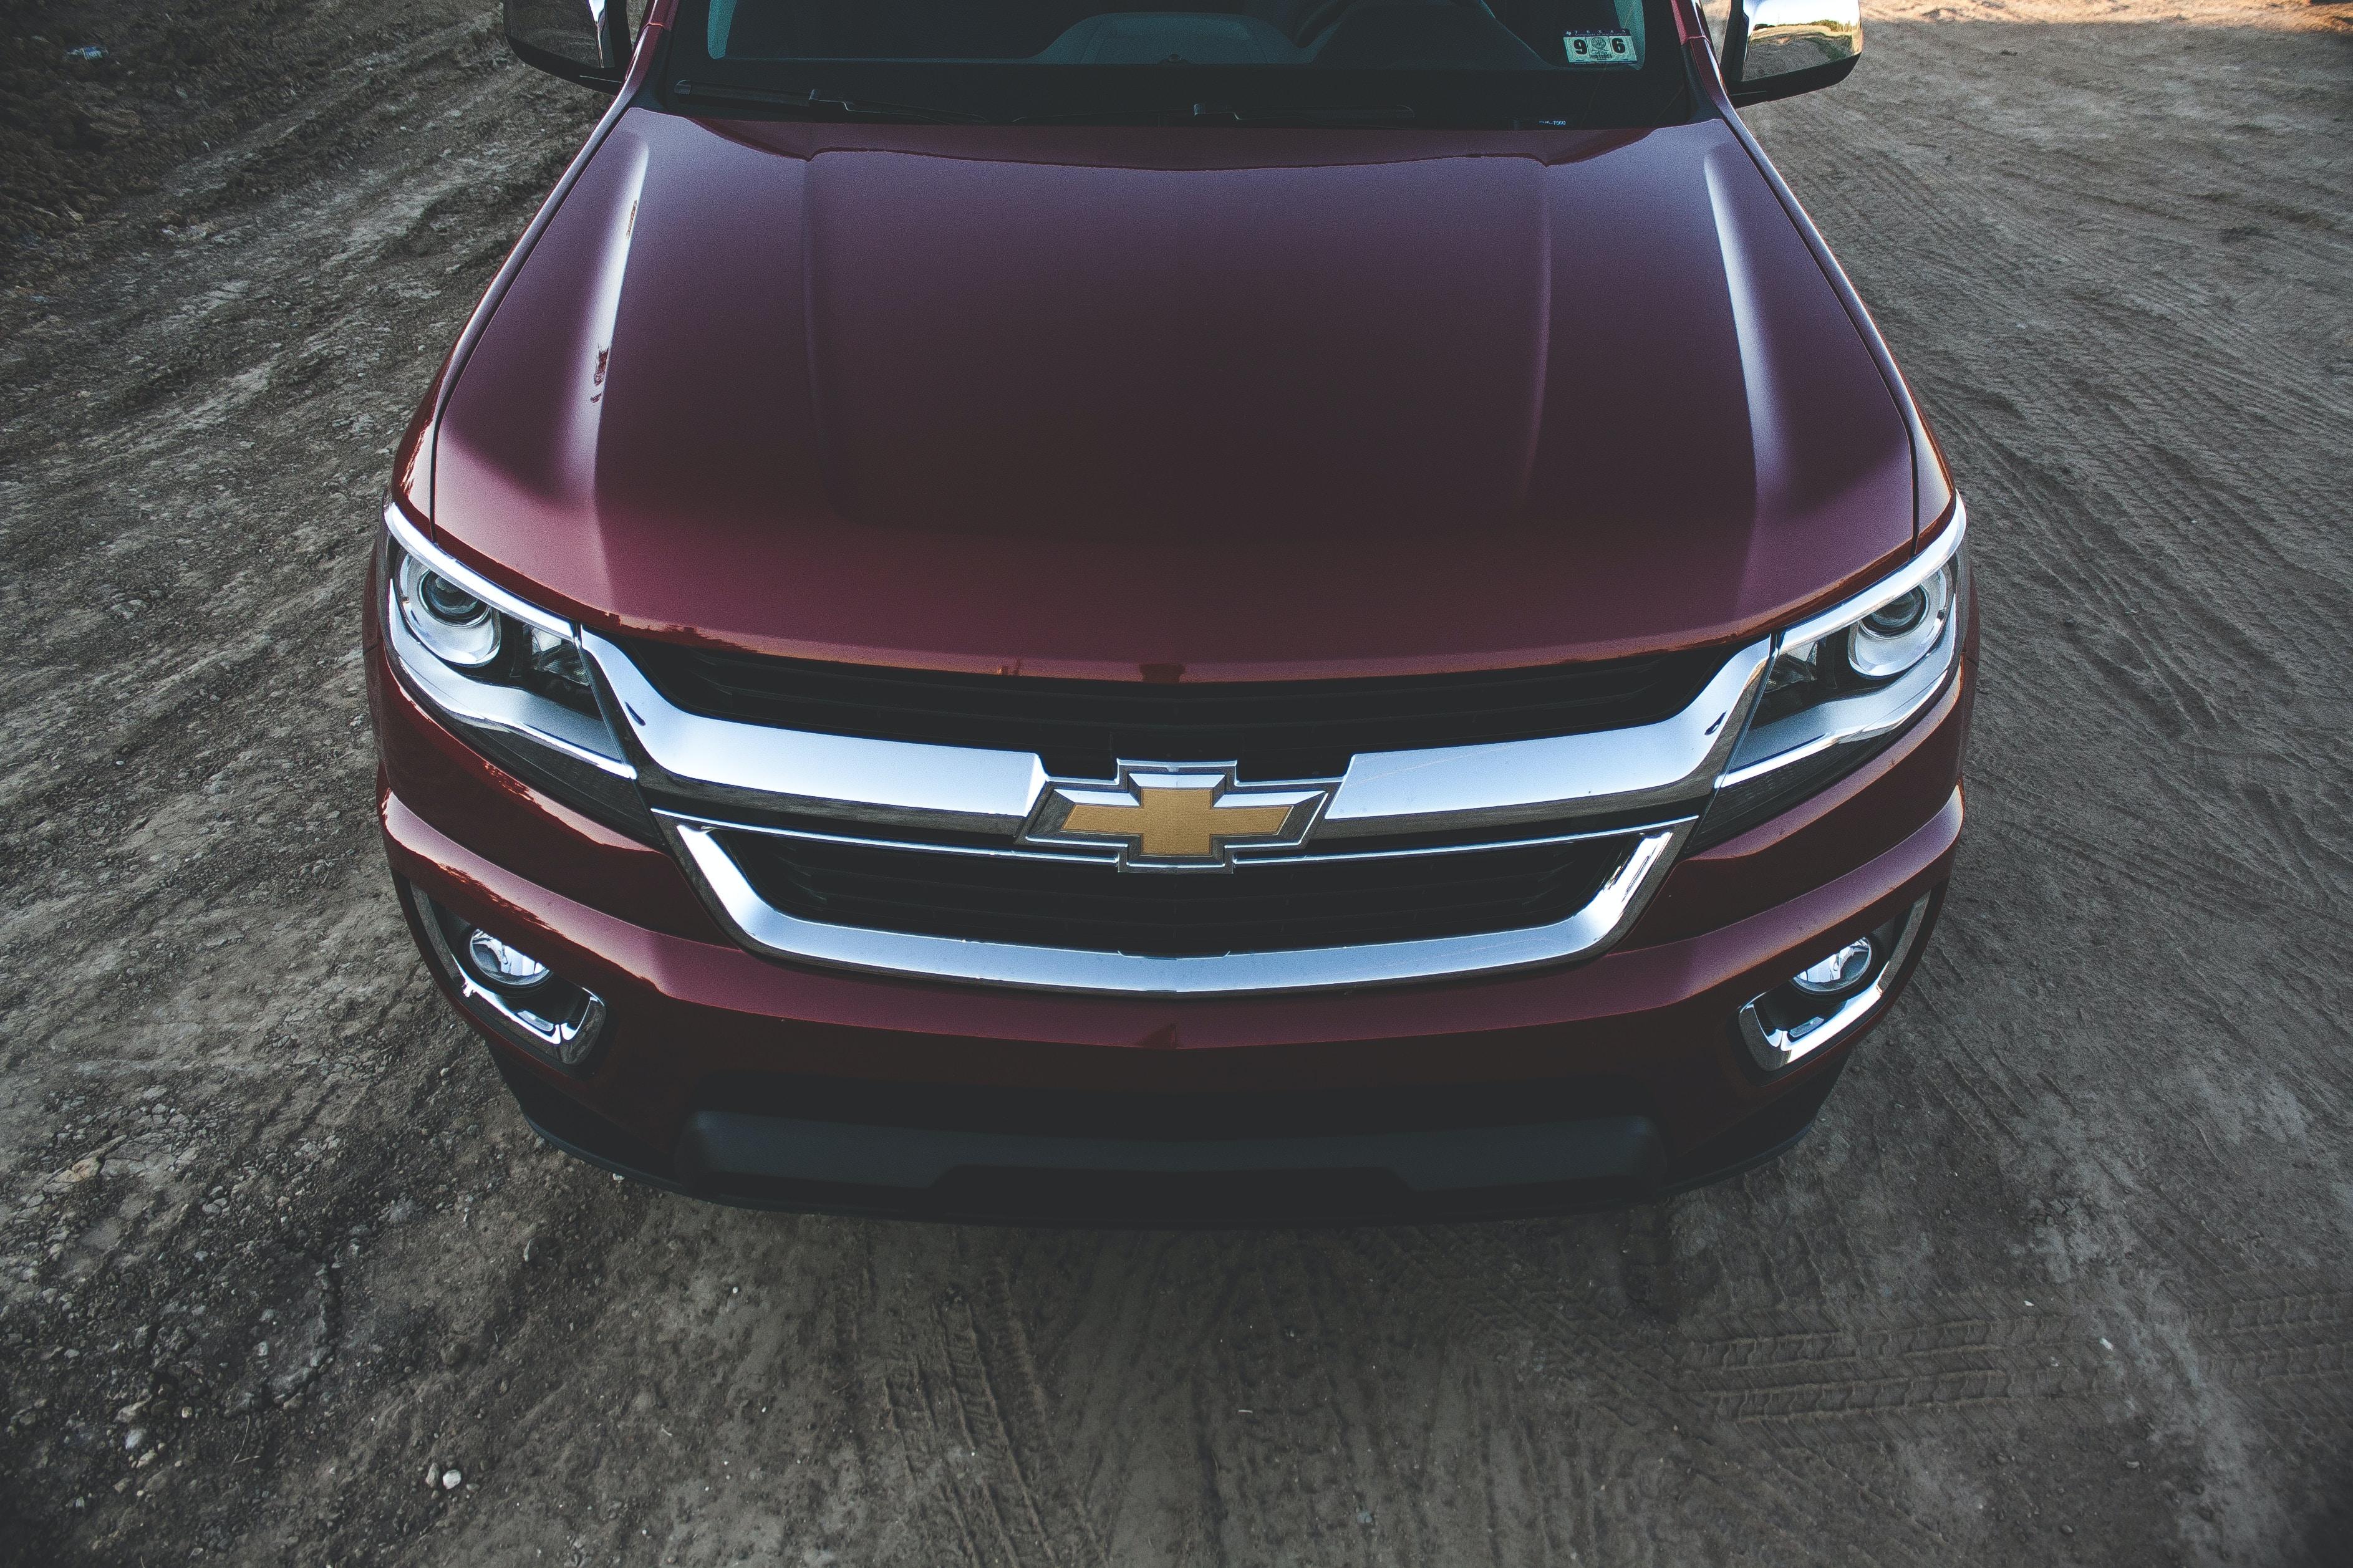 maroon Chevrolet vehicle in closeup photo